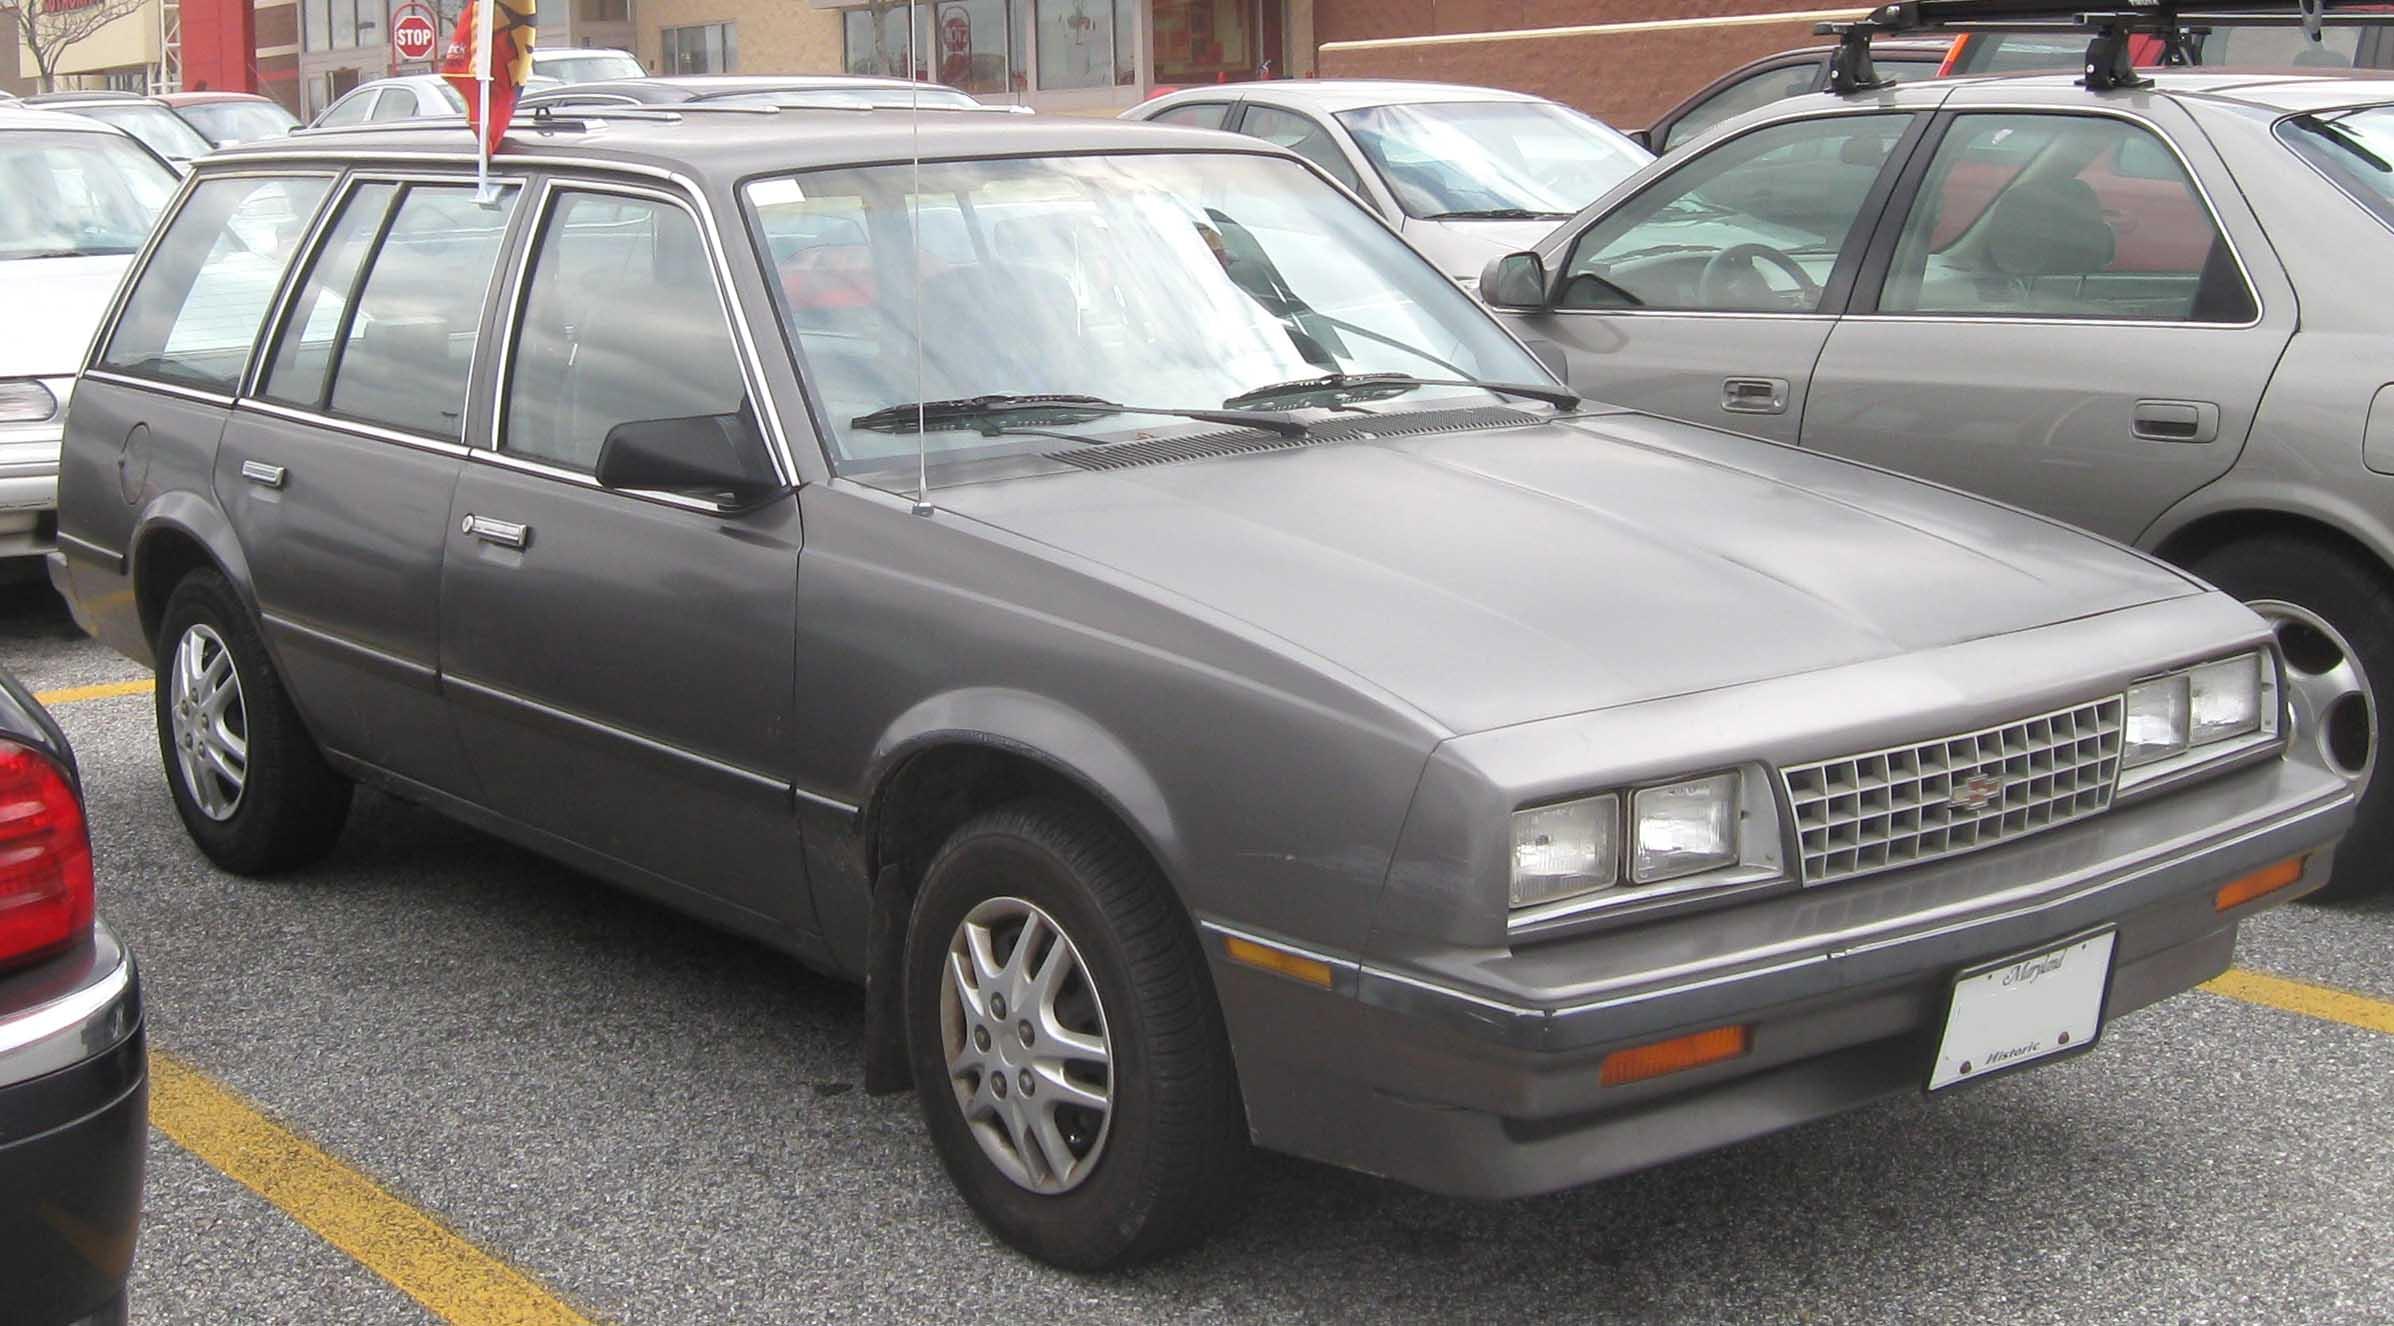 File:1st Chevrolet Cavalier wagon front.jpg - Wikimedia ...